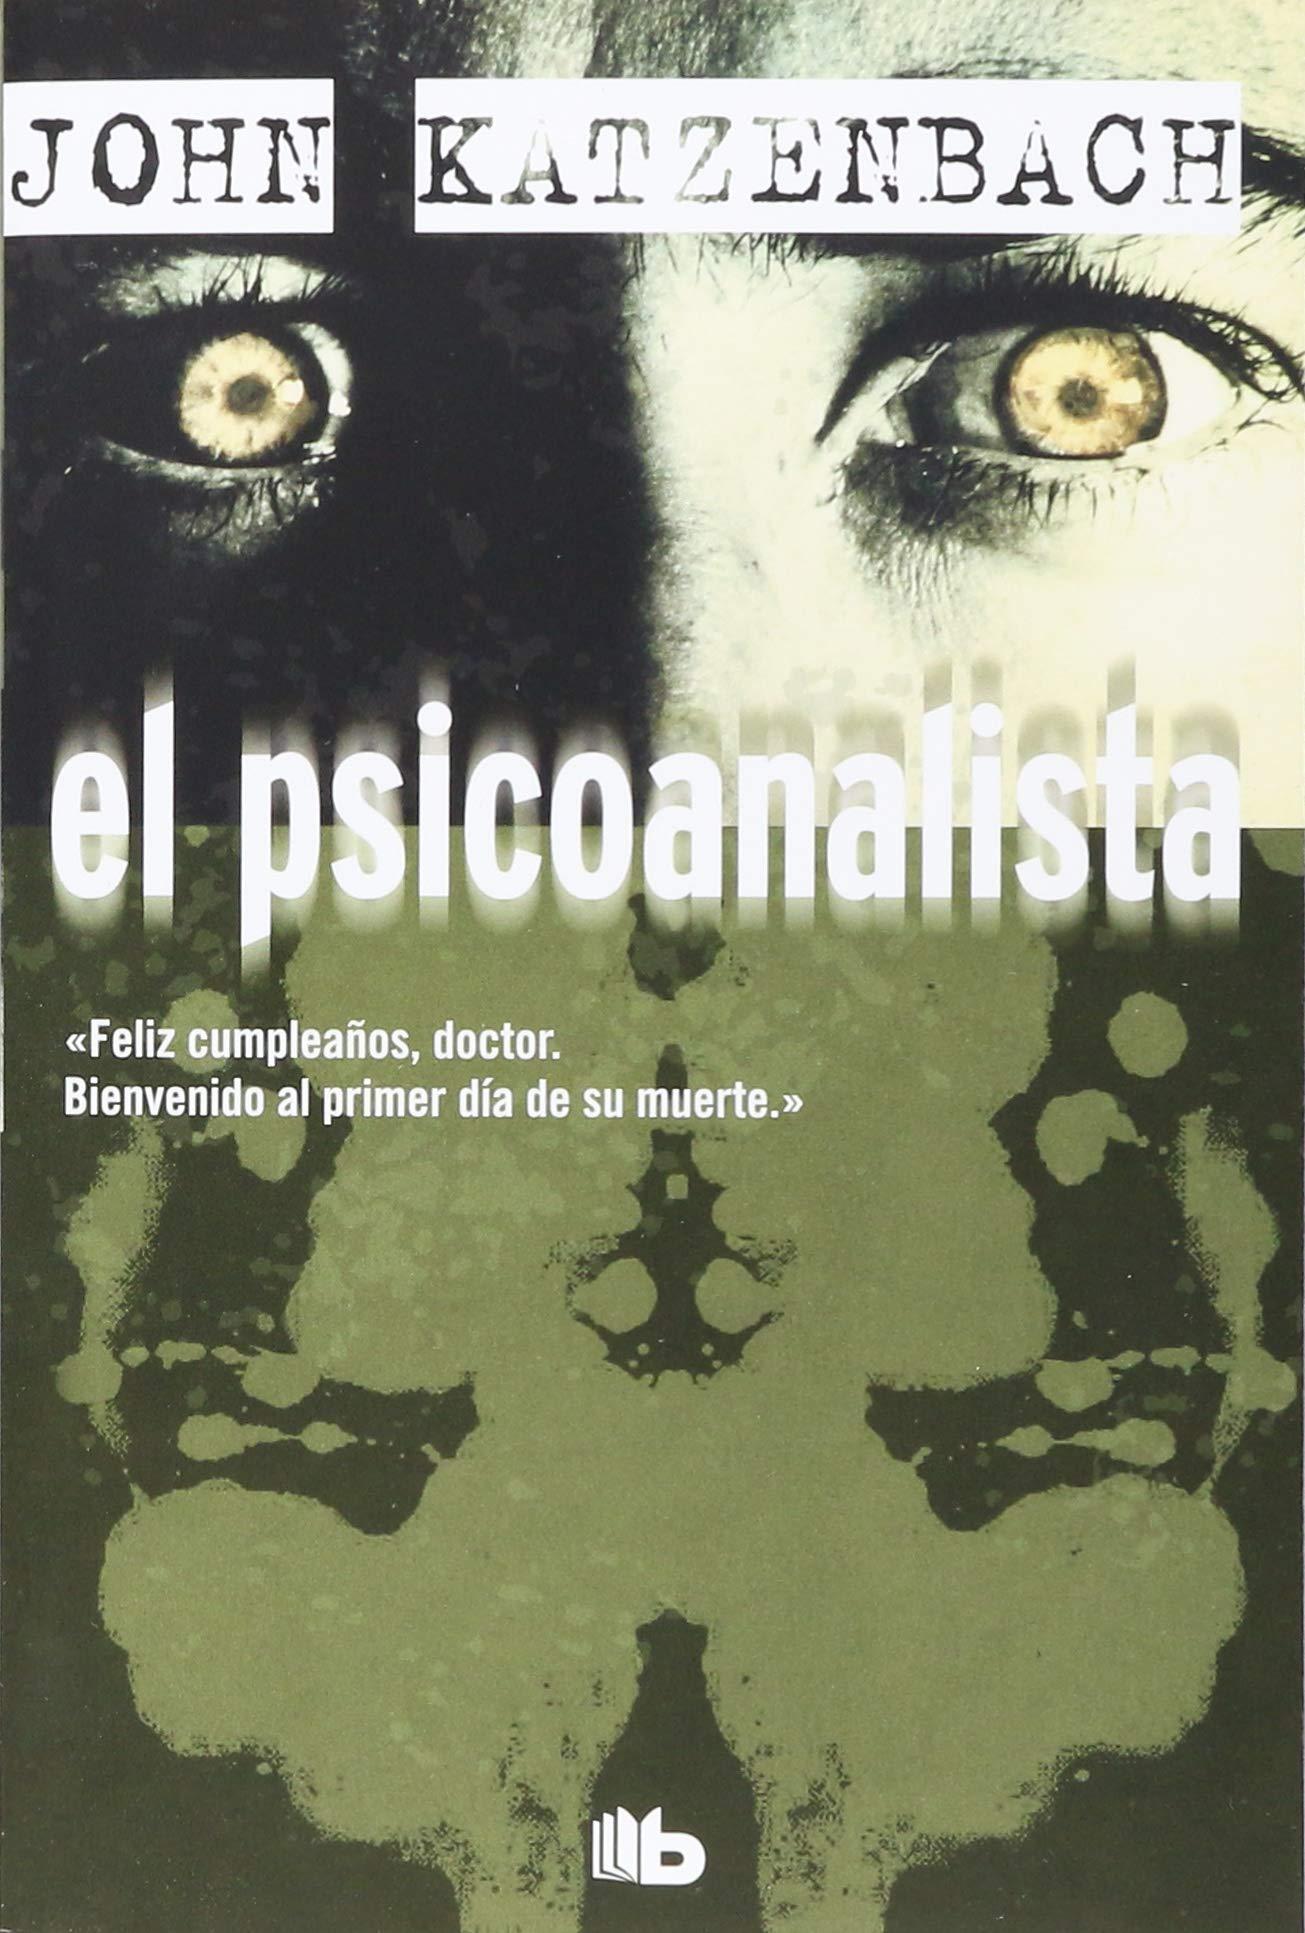 Amazon.com: El psicoanalista / The Analyst (Spanish Edition)  (9781947783492): John Katzenbach: Books